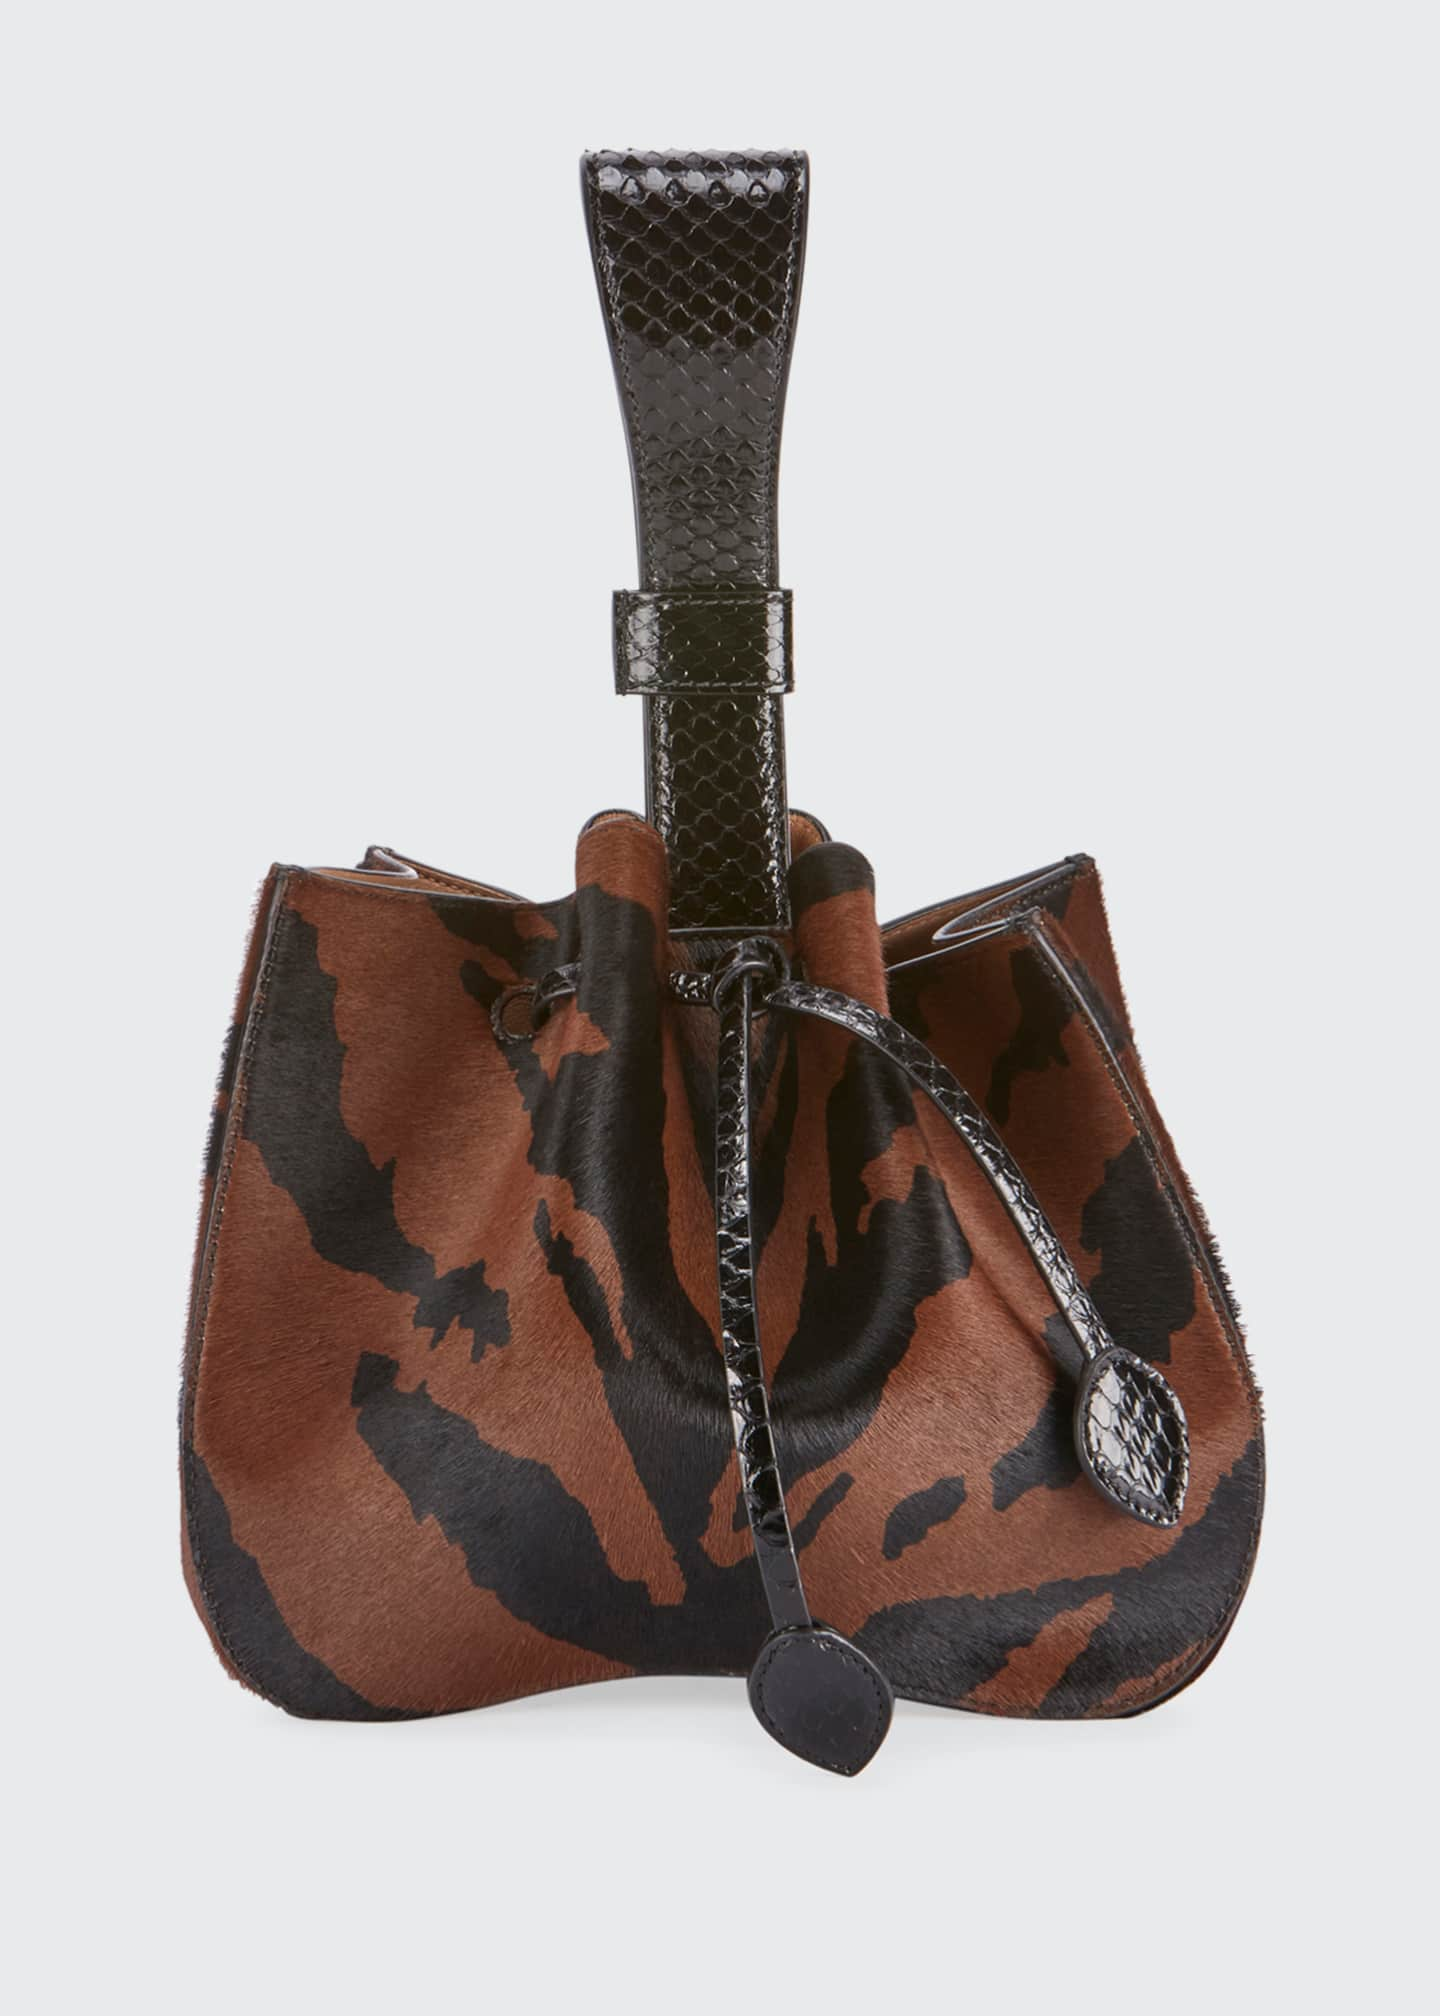 ALAIA Rose Marie Poulain Zebra-Print Bucket Bag